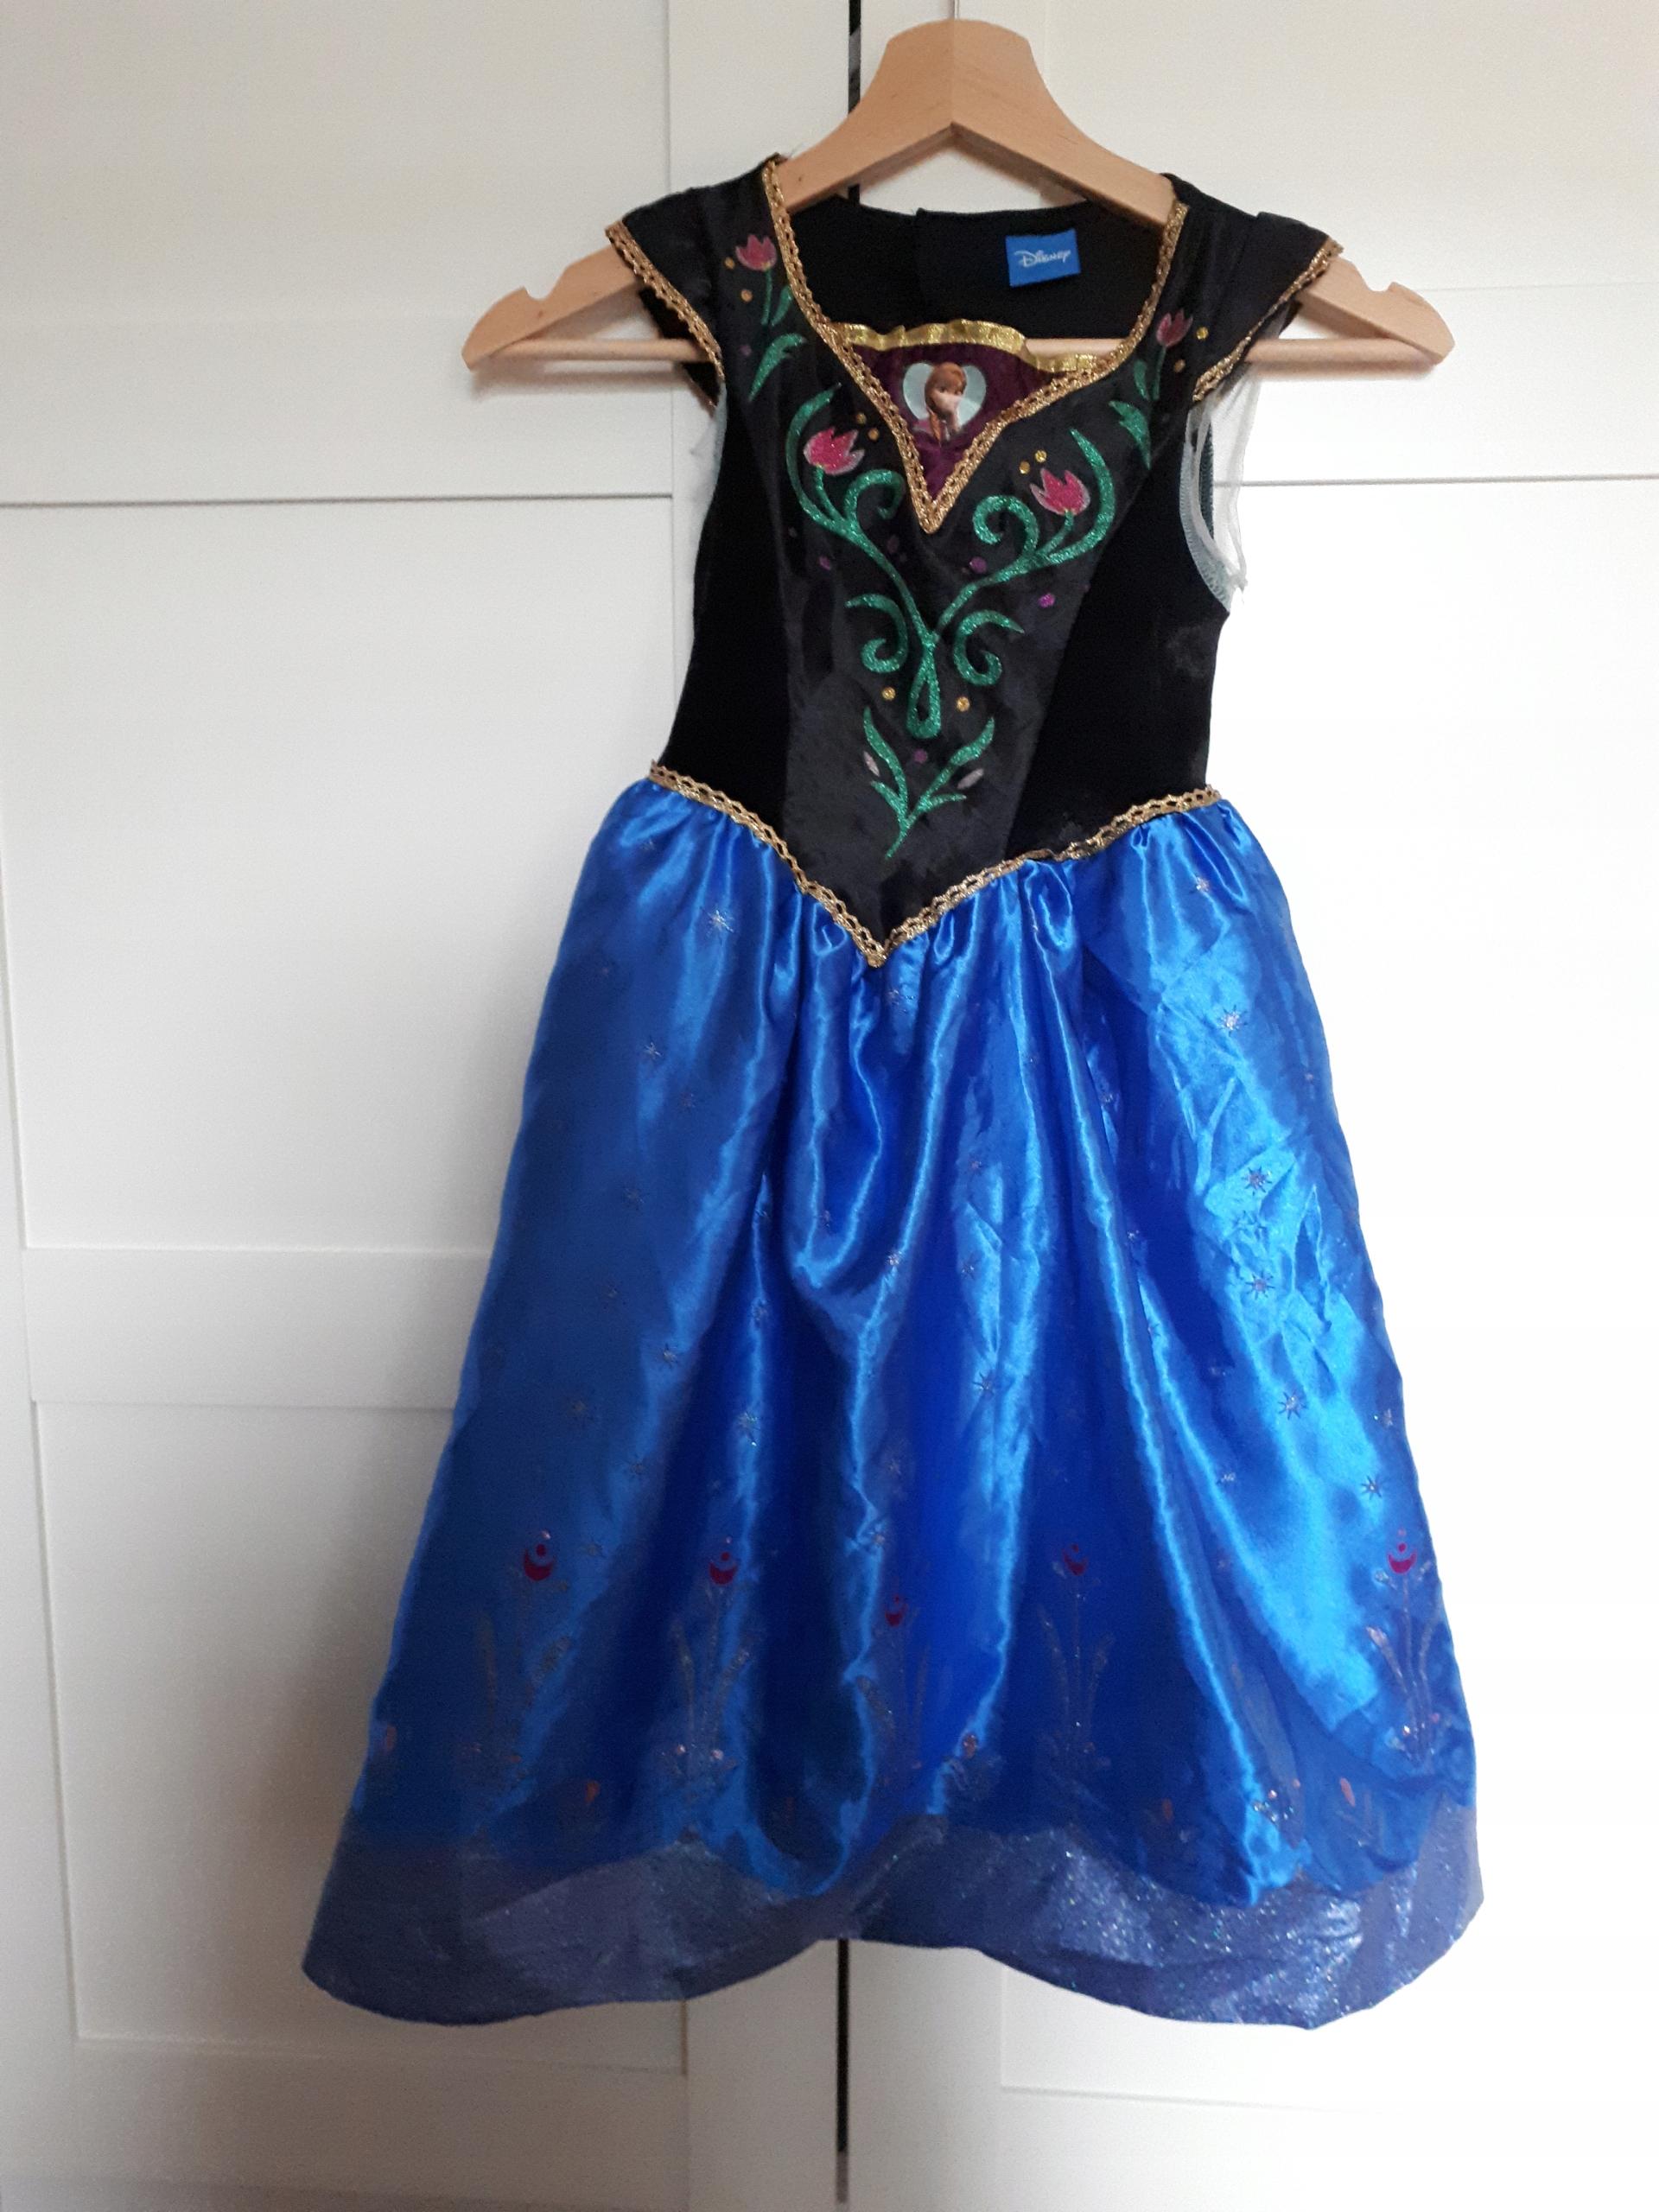 e7e03e25fb sukienka kraina lodu w Oficjalnym Archiwum Allegro - Strona 8 - archiwum  ofert